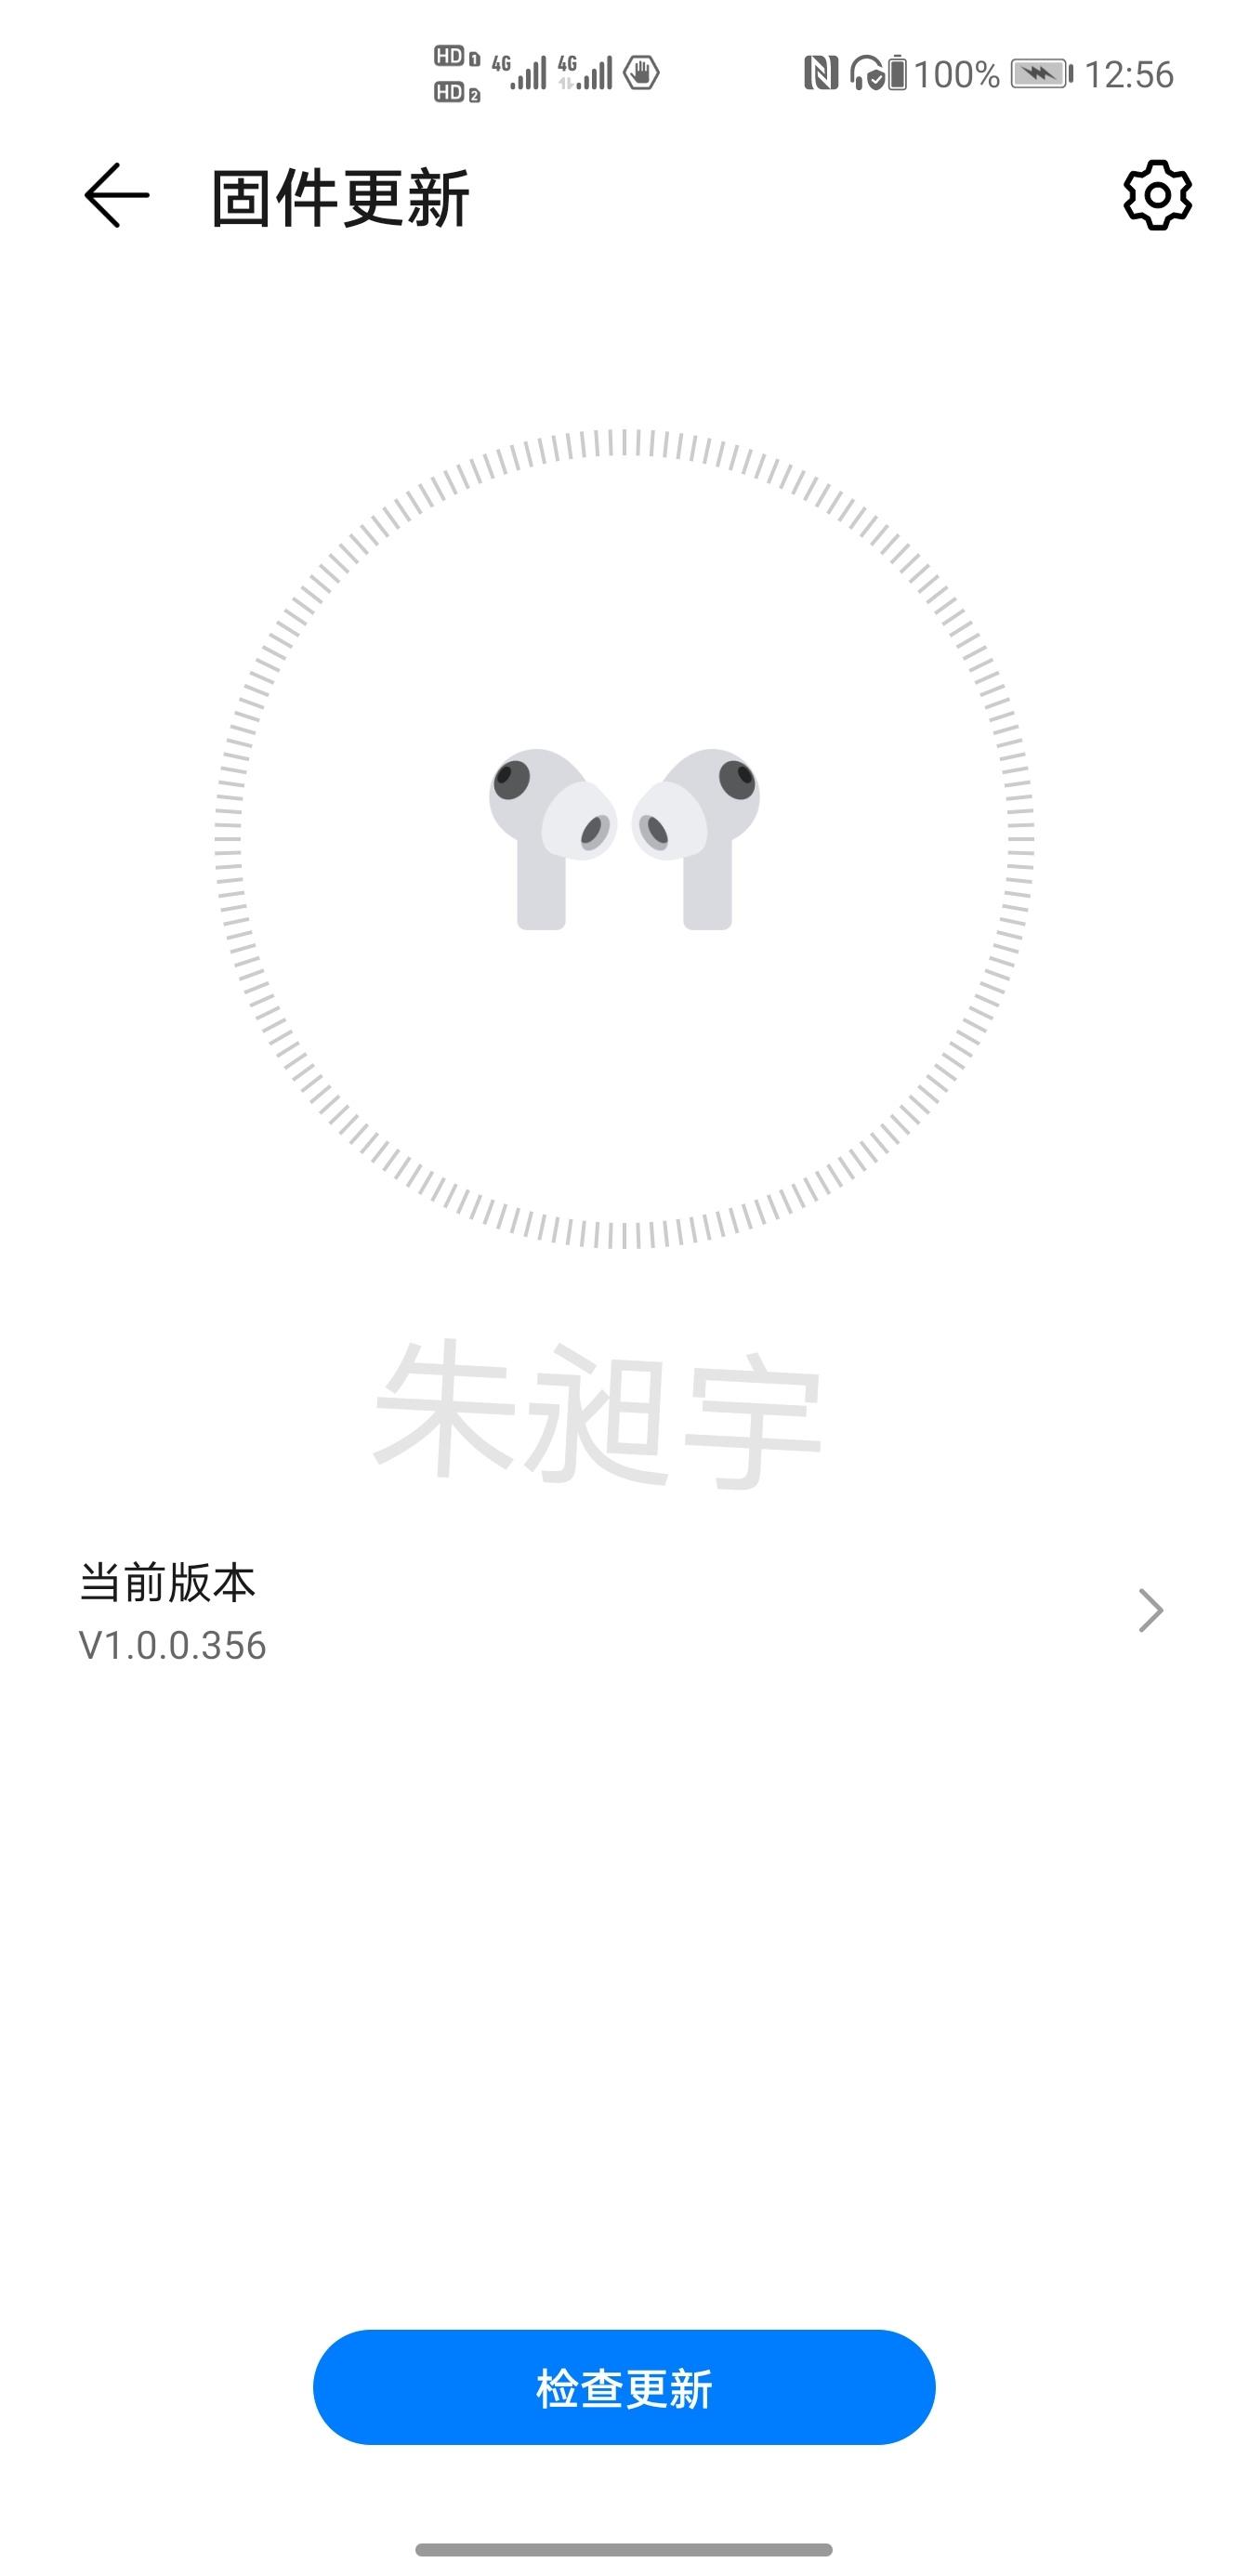 Screenshot_20210329_125626_com.huawei.smarthome_edit_487528818583941.jpg